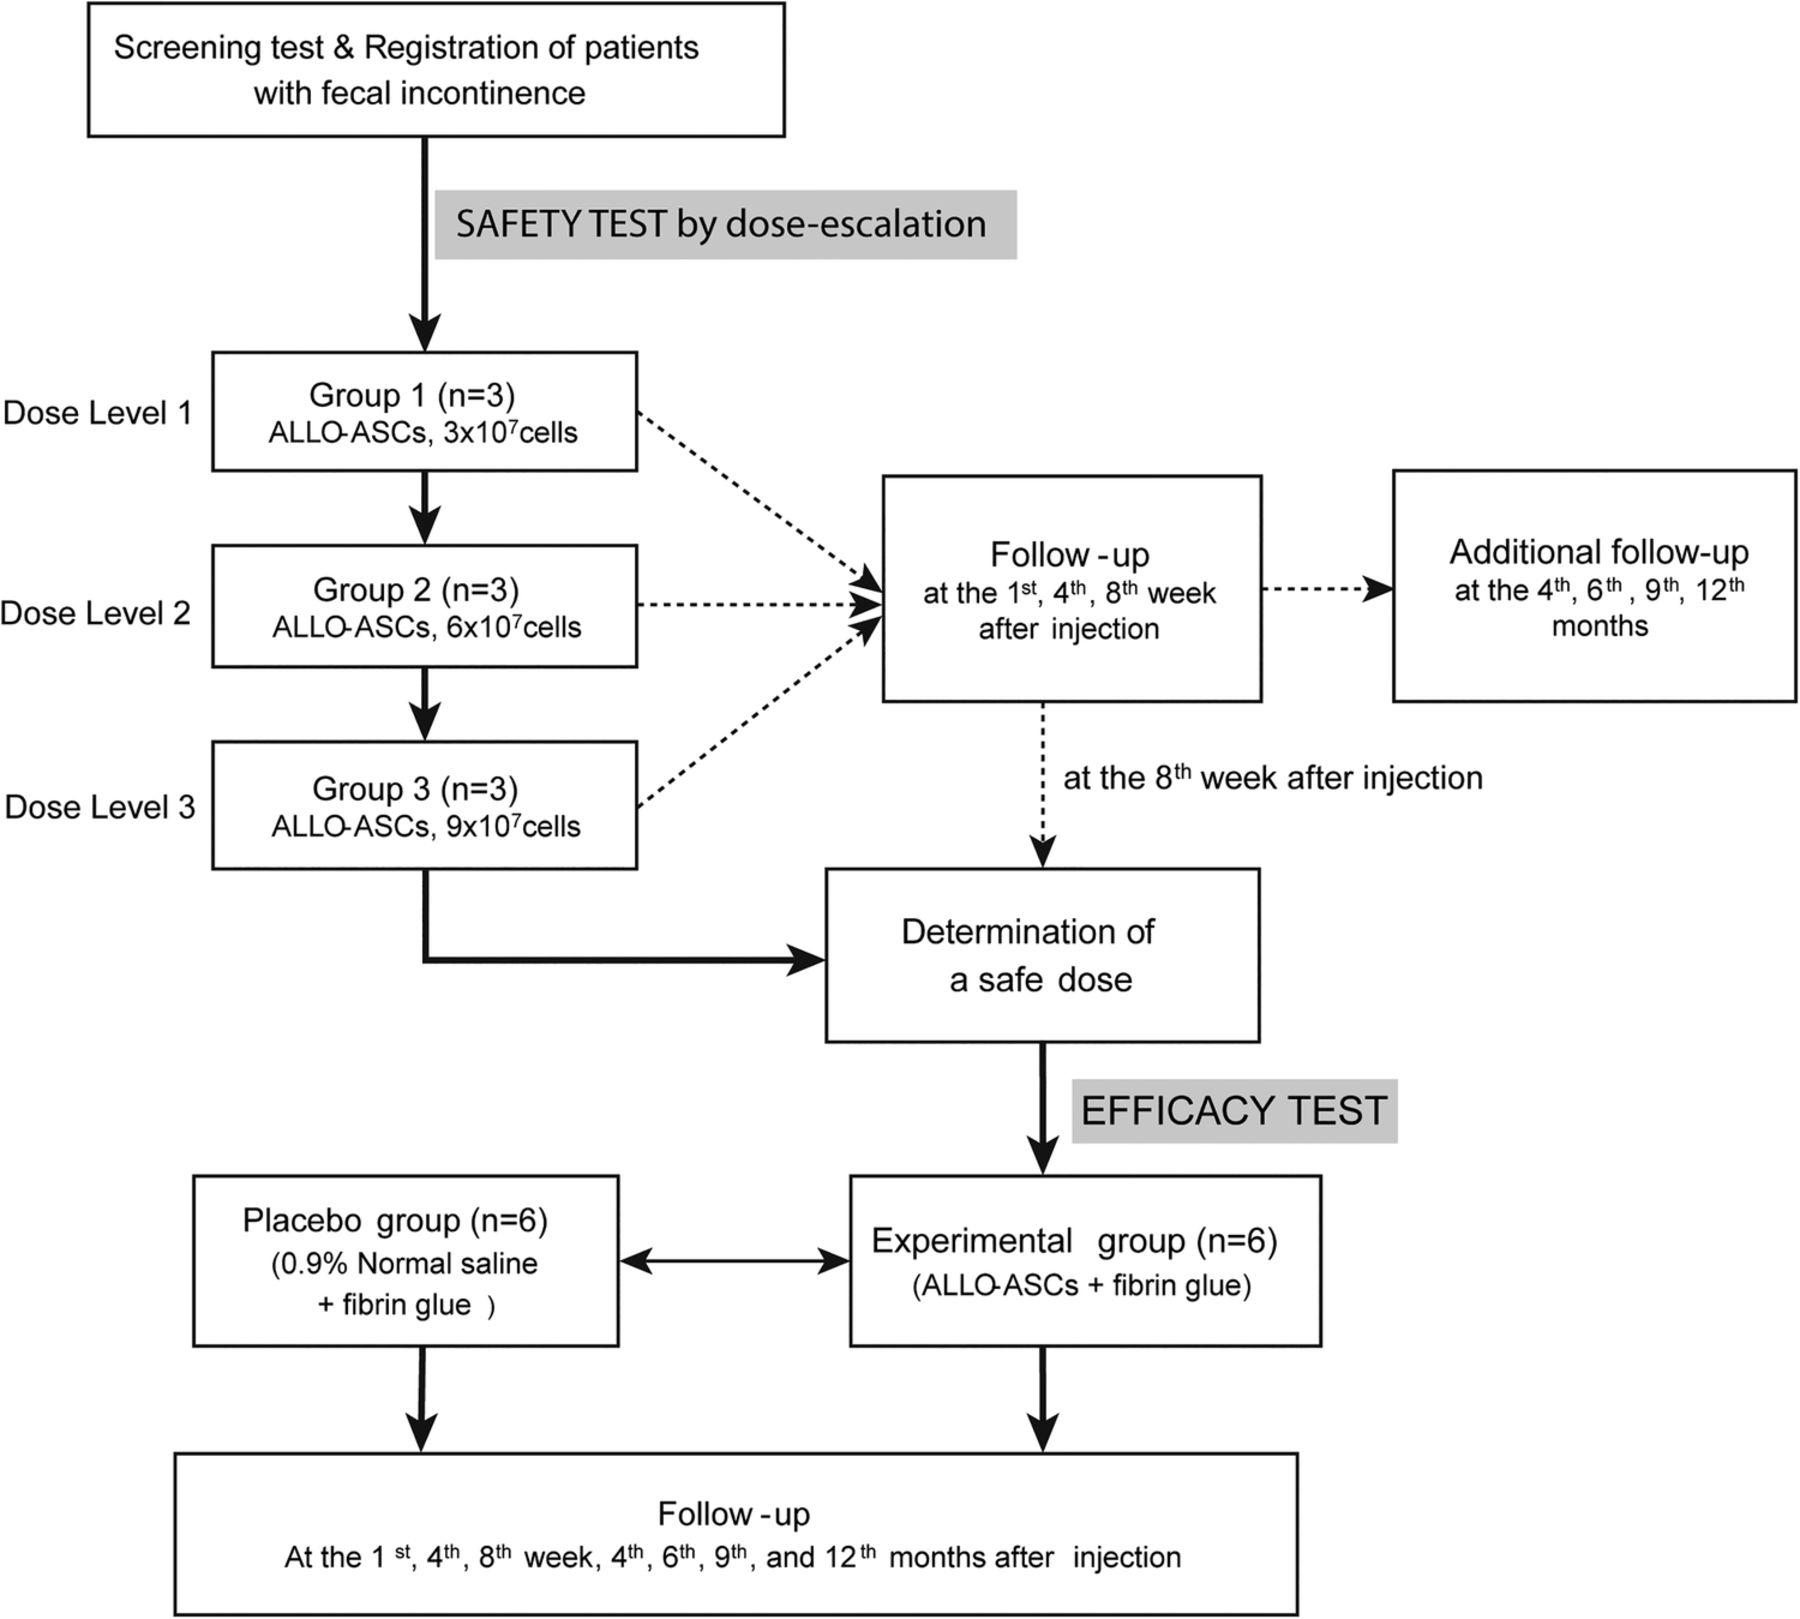 Treatment of faecal incontinence using allogeneic-adipose